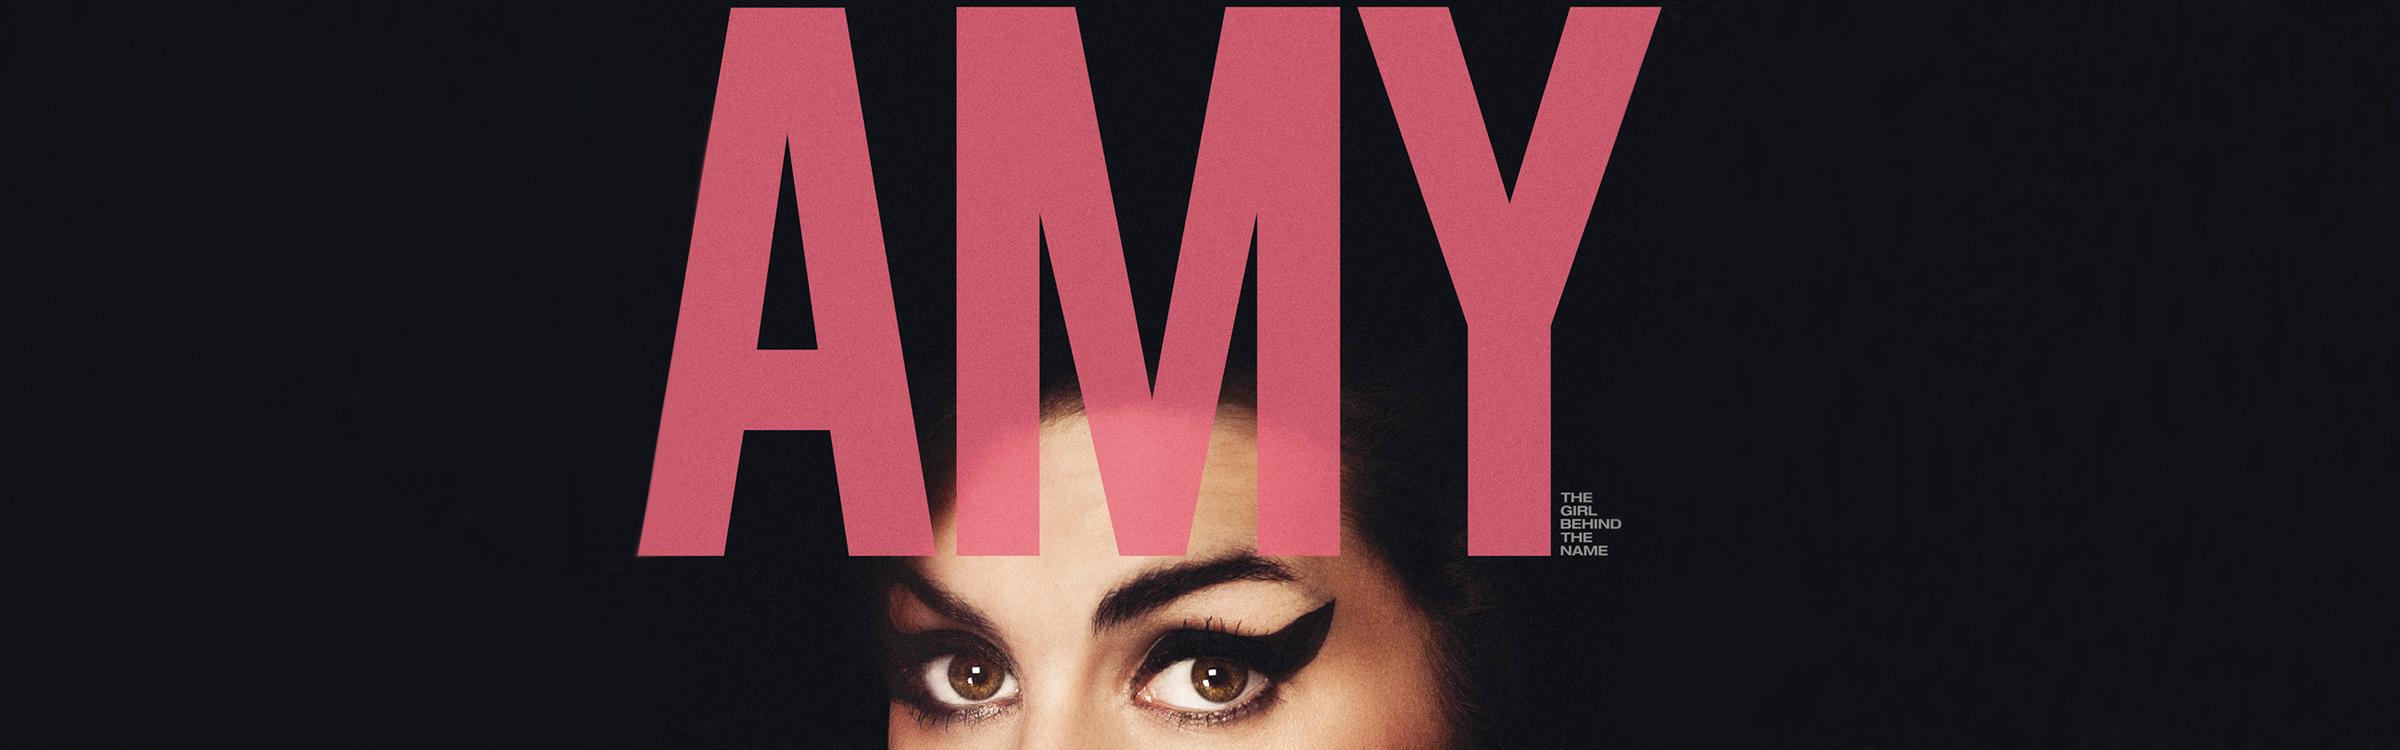 Amy2400